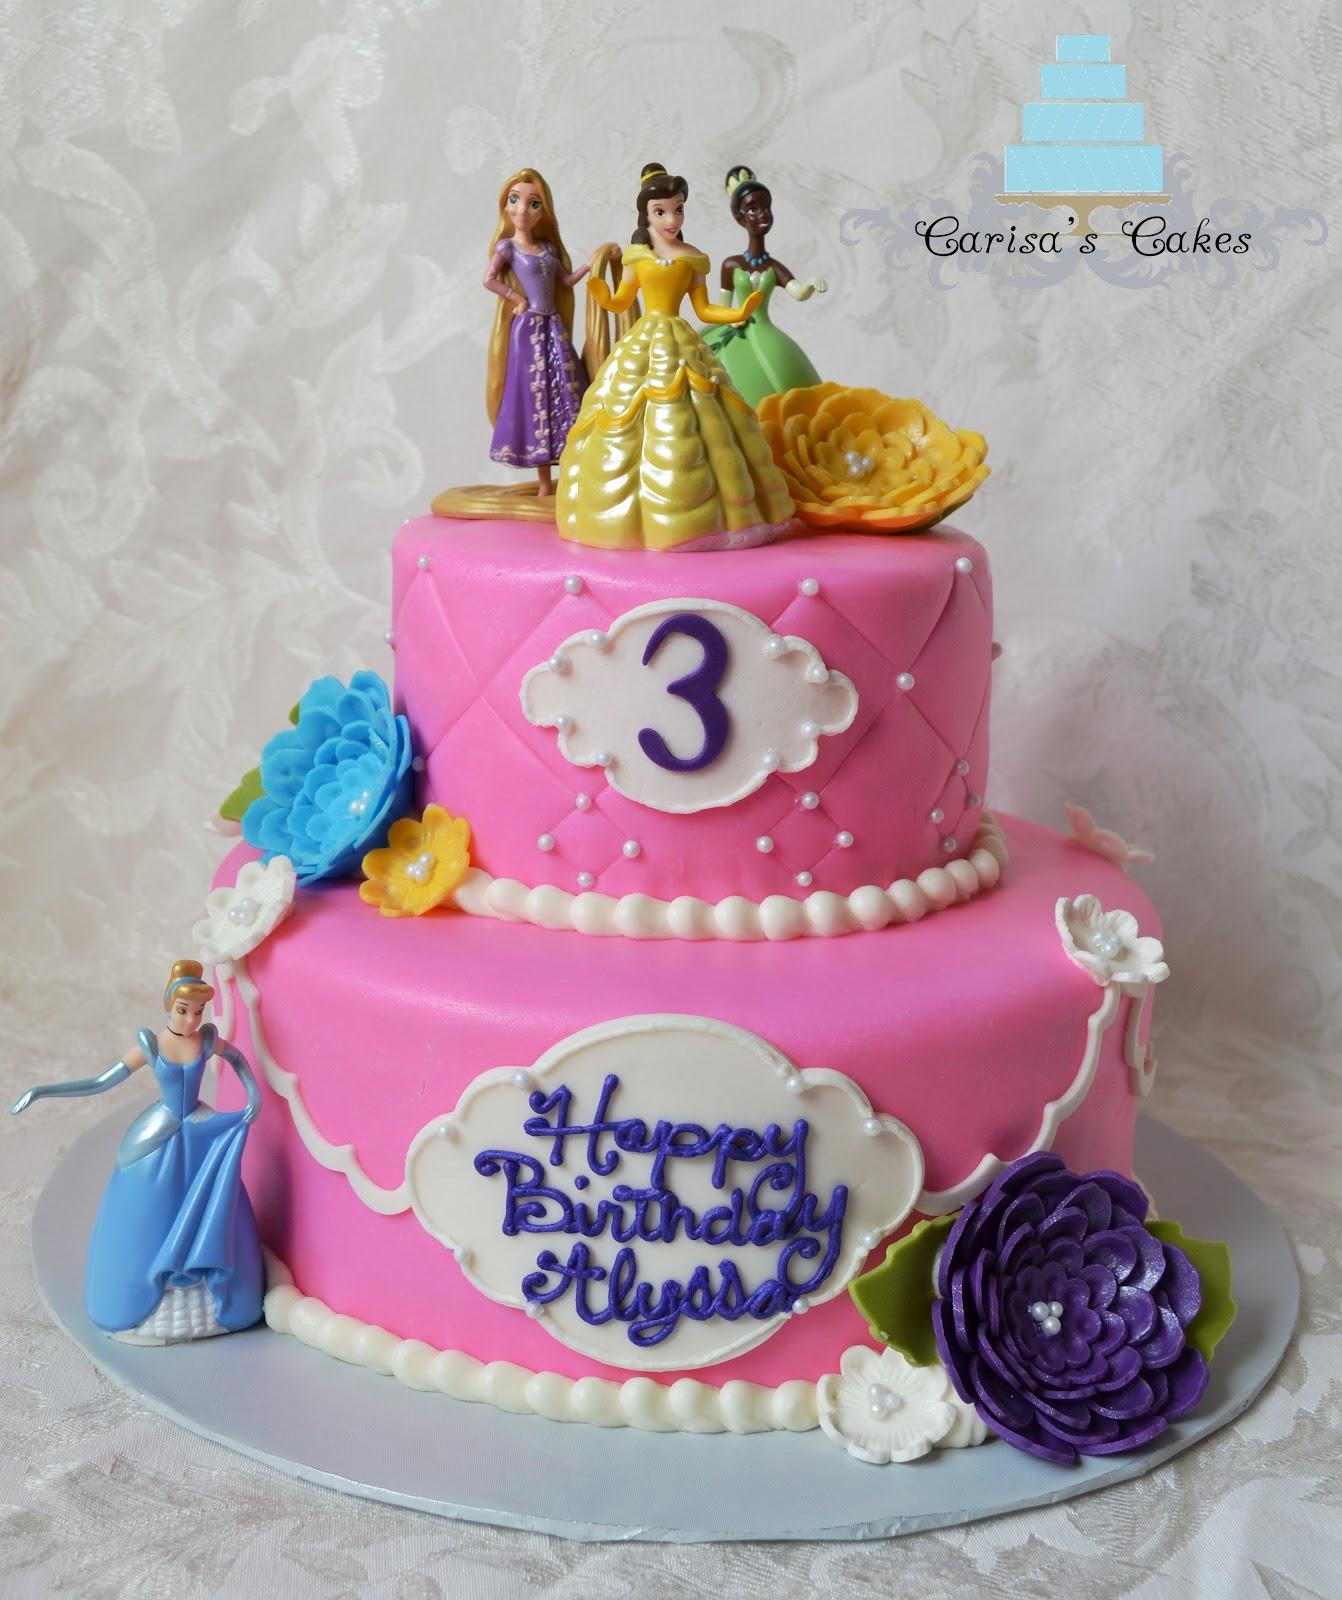 http://2.bp.blogspot.com/-57jVby6Ry2Q/T2abHJT_95I/AAAAAAAAB14/CN0mZ7vgYeA/s1600/Cakes%20in%20March%20017.JPG